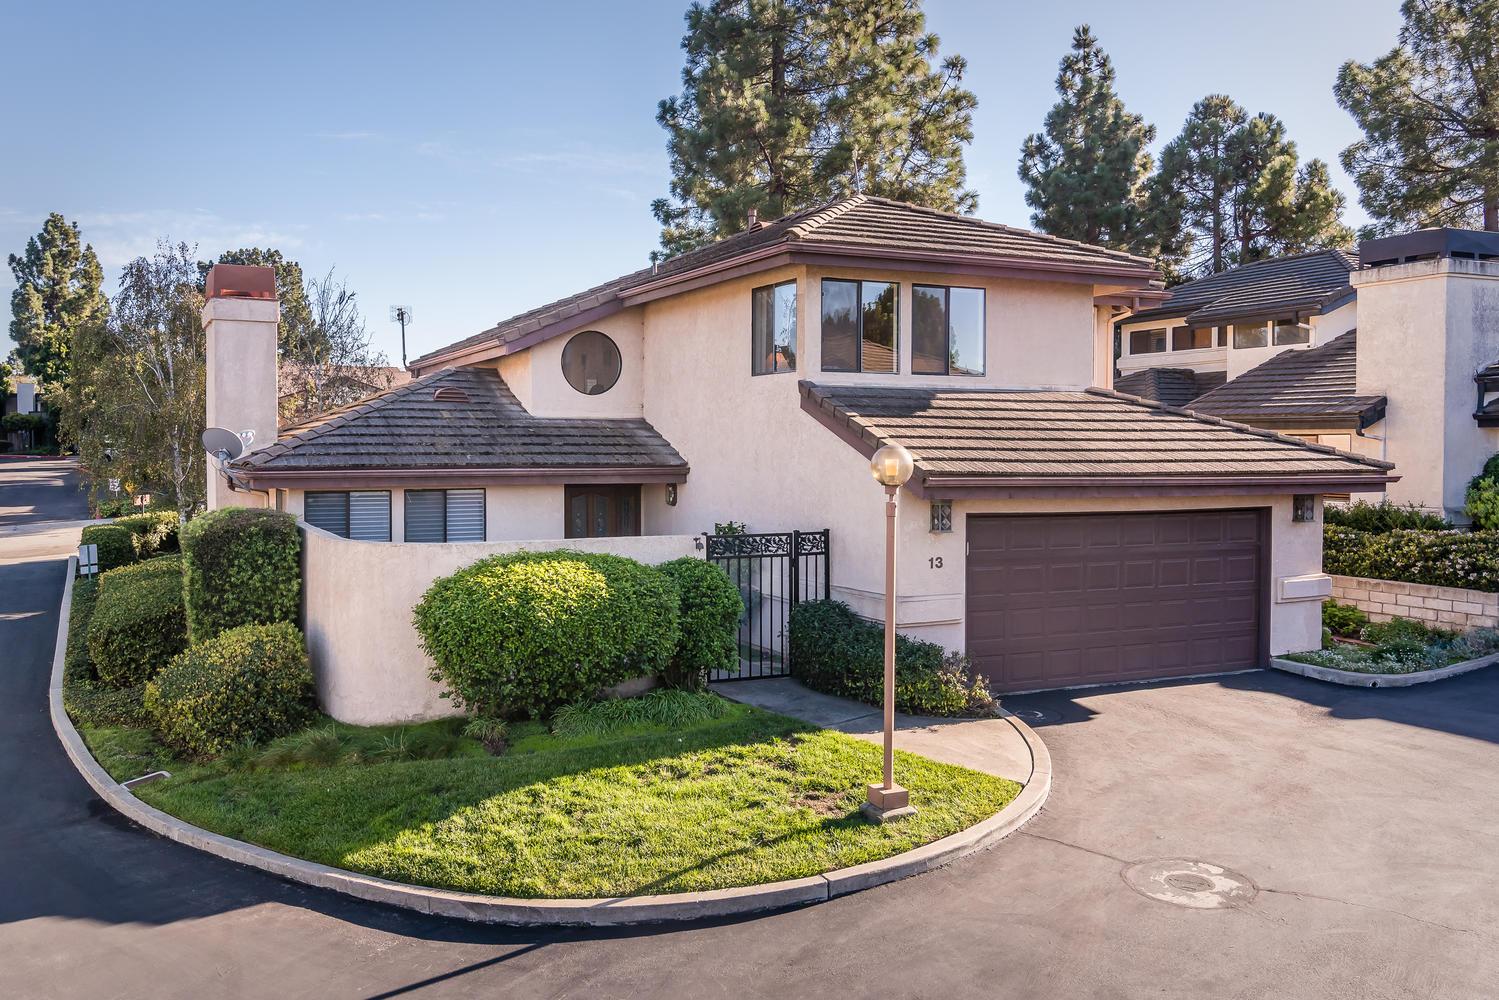 1490 Descanso St, San Luis Obispo, CA 93405